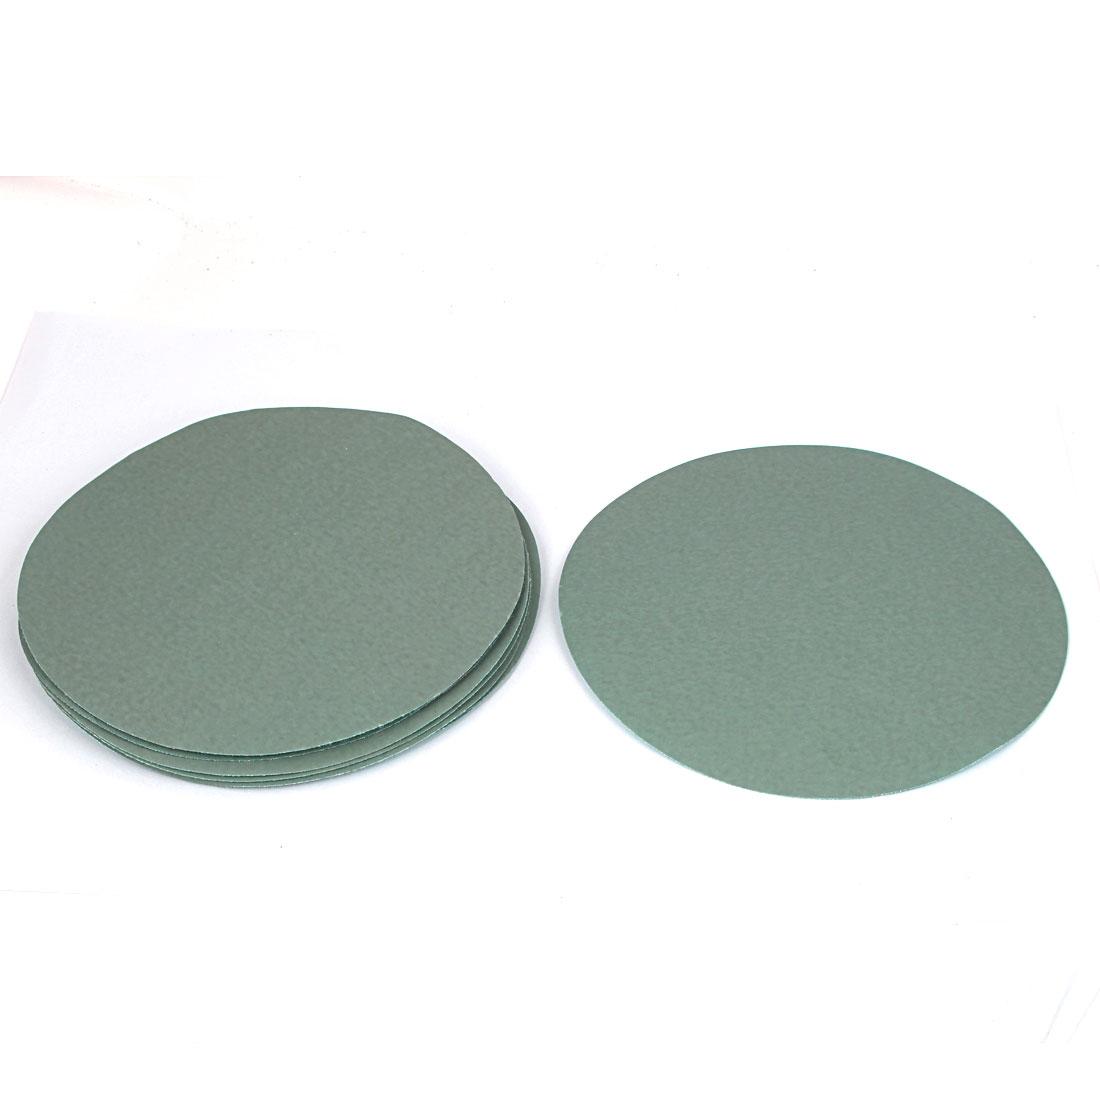 "7"" Dia Wet Dry Silicone Carbide 3000 Grit Polishing Sand Paper 10pcs"